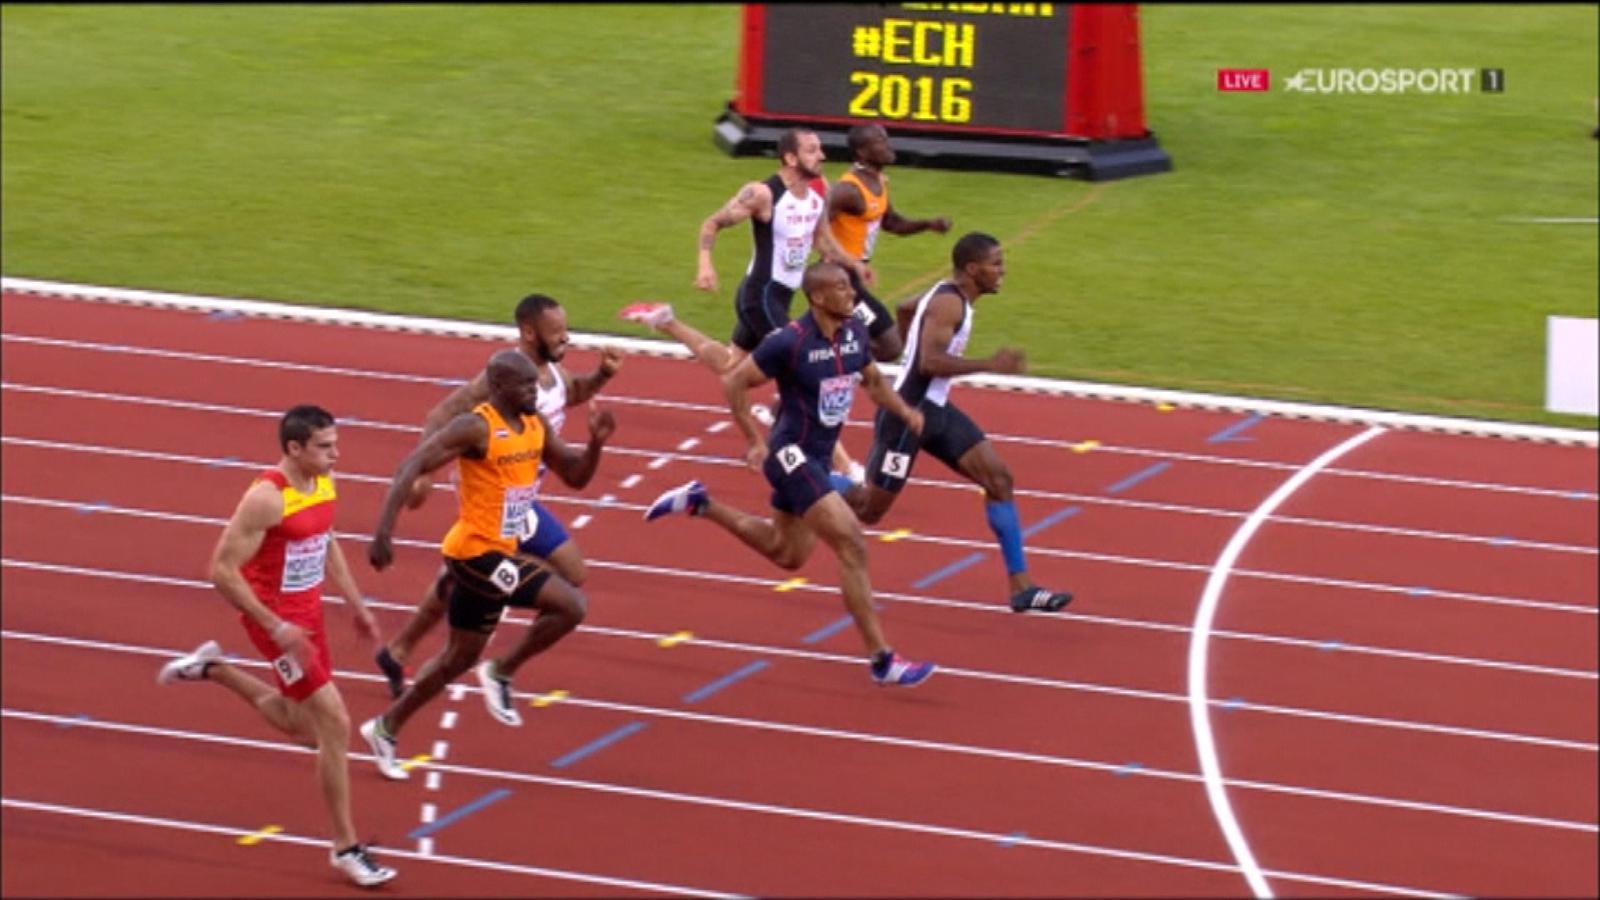 VIDEO - Churandy Martina takes 100m glory after photo finish - European Championships - Video ...